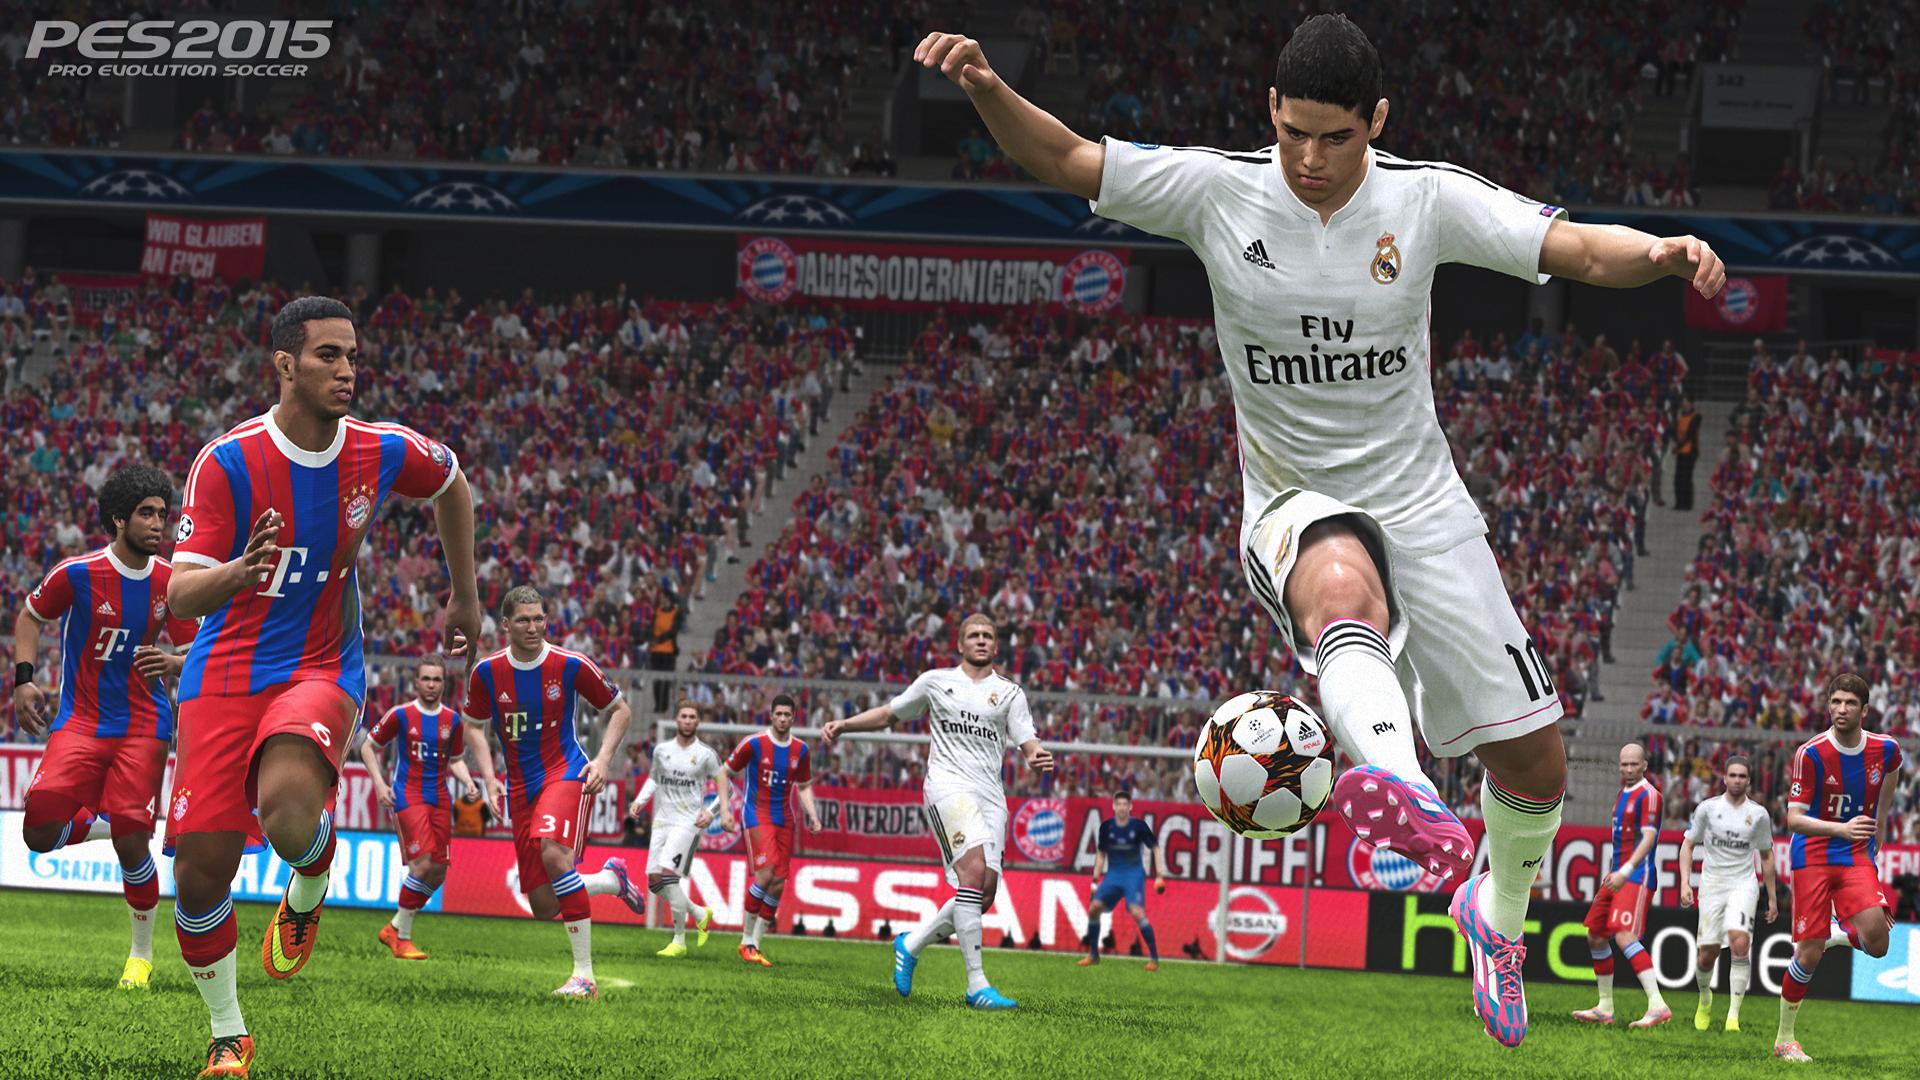 Pro Evolution Soccer 2015 PC Multilenguaje ESPAÑOL + Update v1.03 (RELOADED) 4